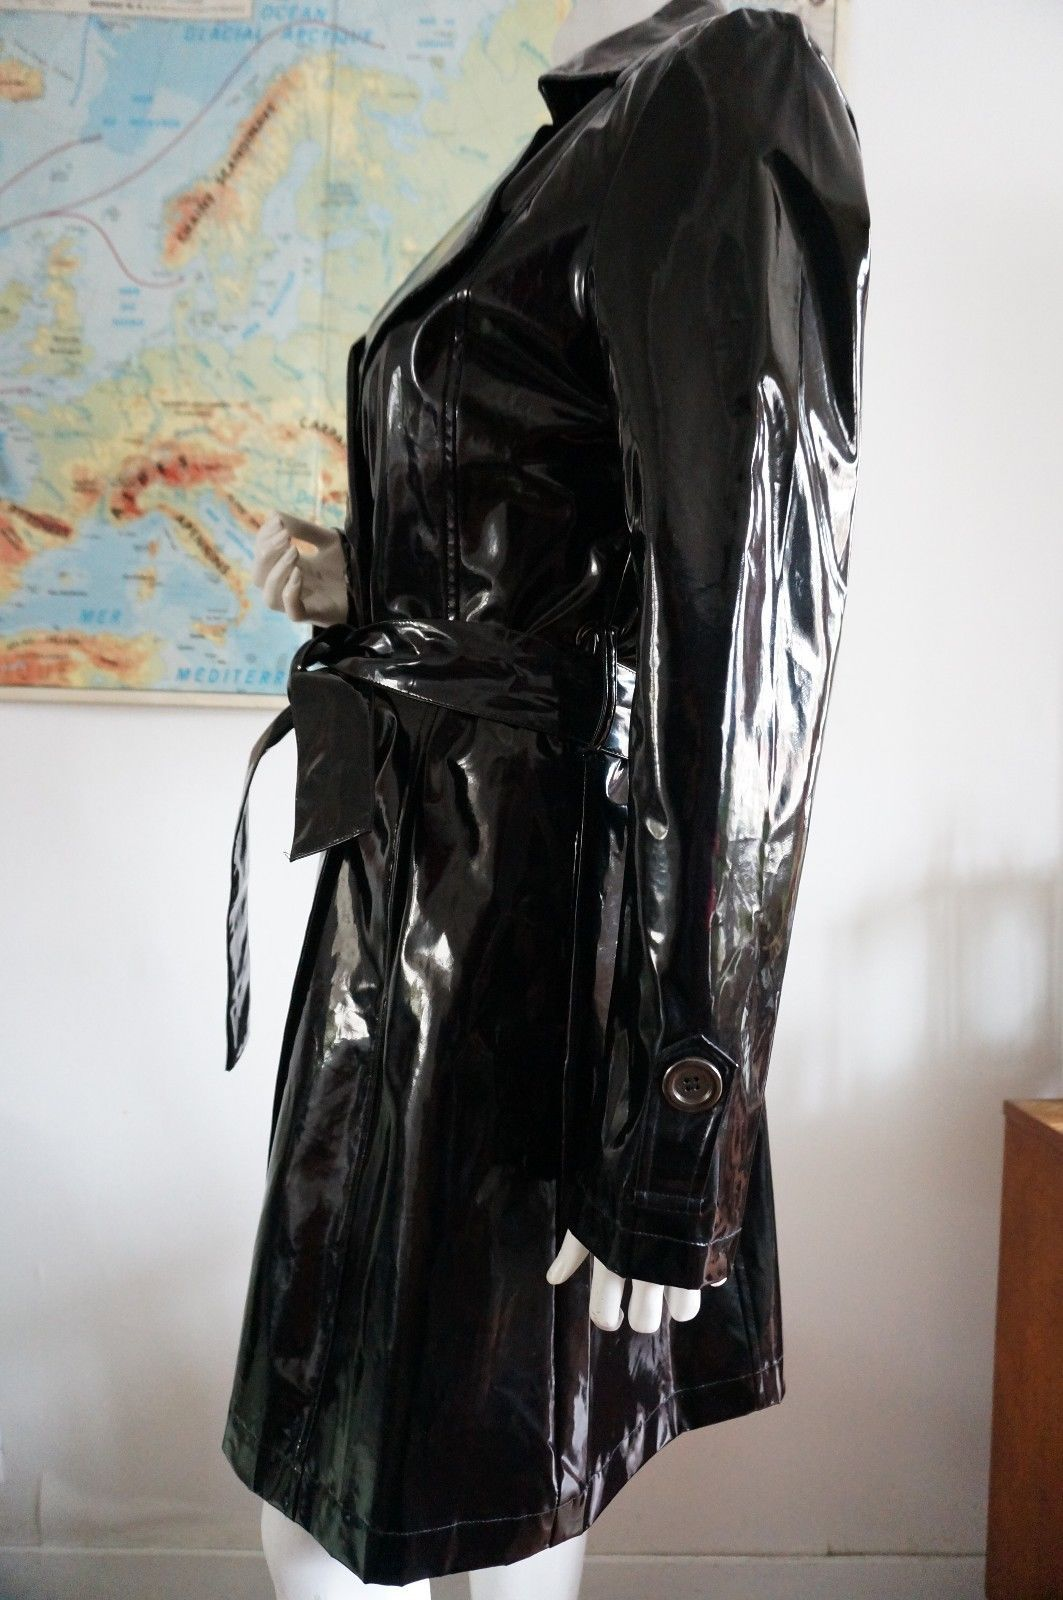 cir taille 38 trench coat vnyl pvc noir brillant impermeable 2 pinterest pvc. Black Bedroom Furniture Sets. Home Design Ideas